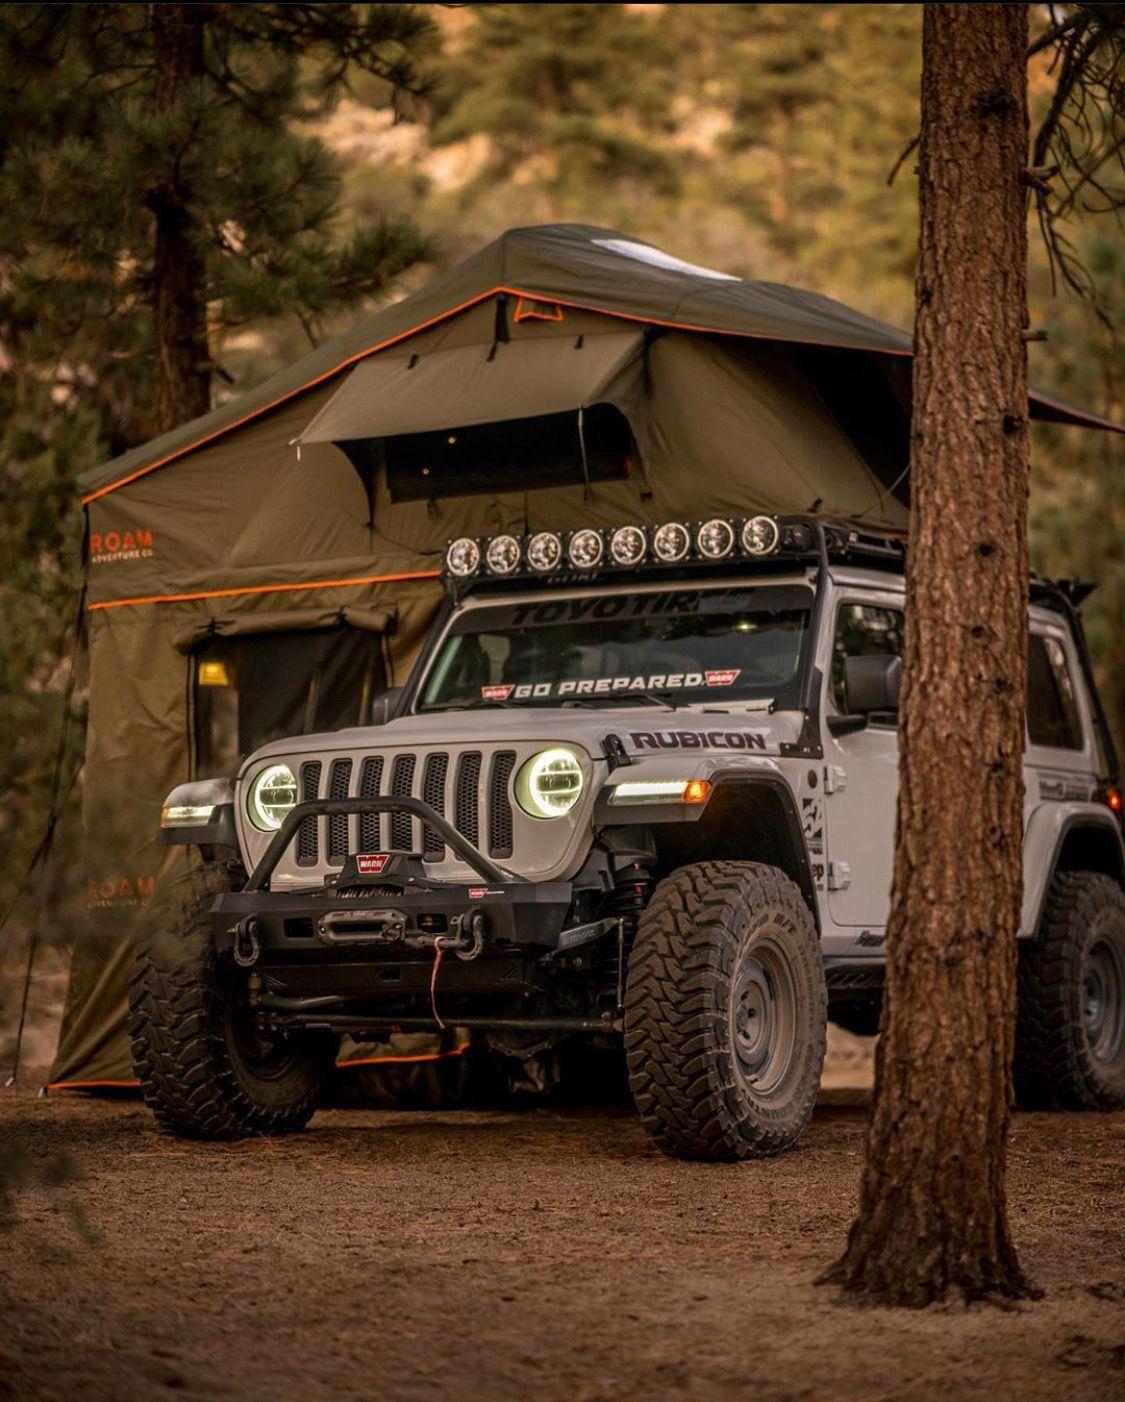 Happy Halloween Bearded Wrangler Protaco17 Lifted Jeep Wrangler Rubicon Jl Overlanding Lifted Jeep